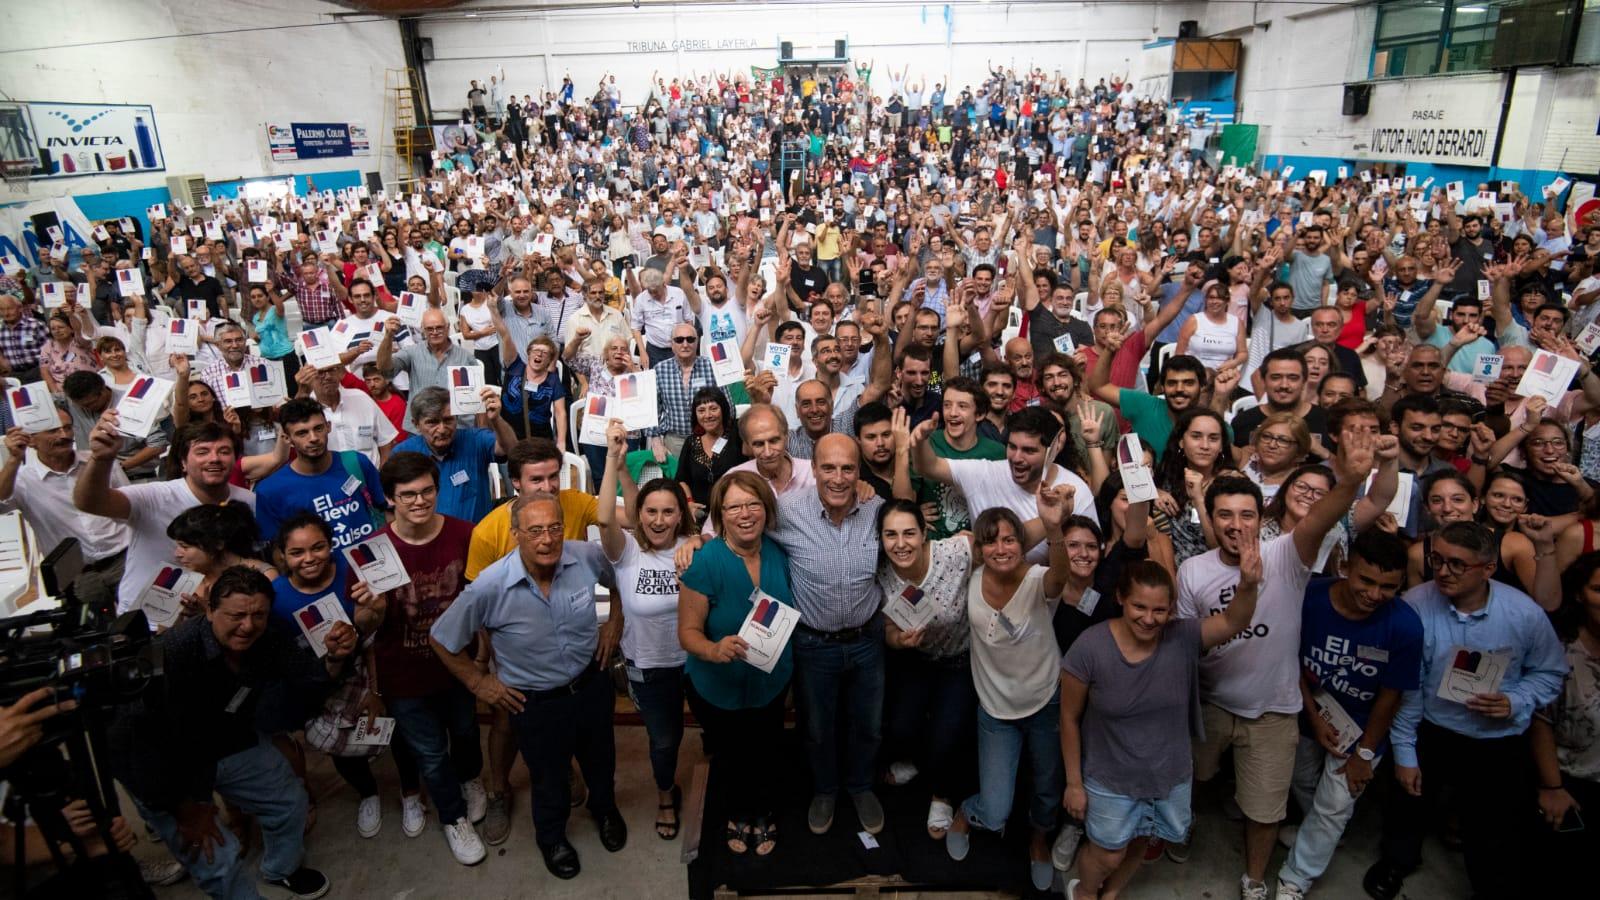 49° Congreso Ordinario #PaulinaLuisi #SocialistasYFeministas Y 29° Congreso Extraordinario #ContigoSocialismo